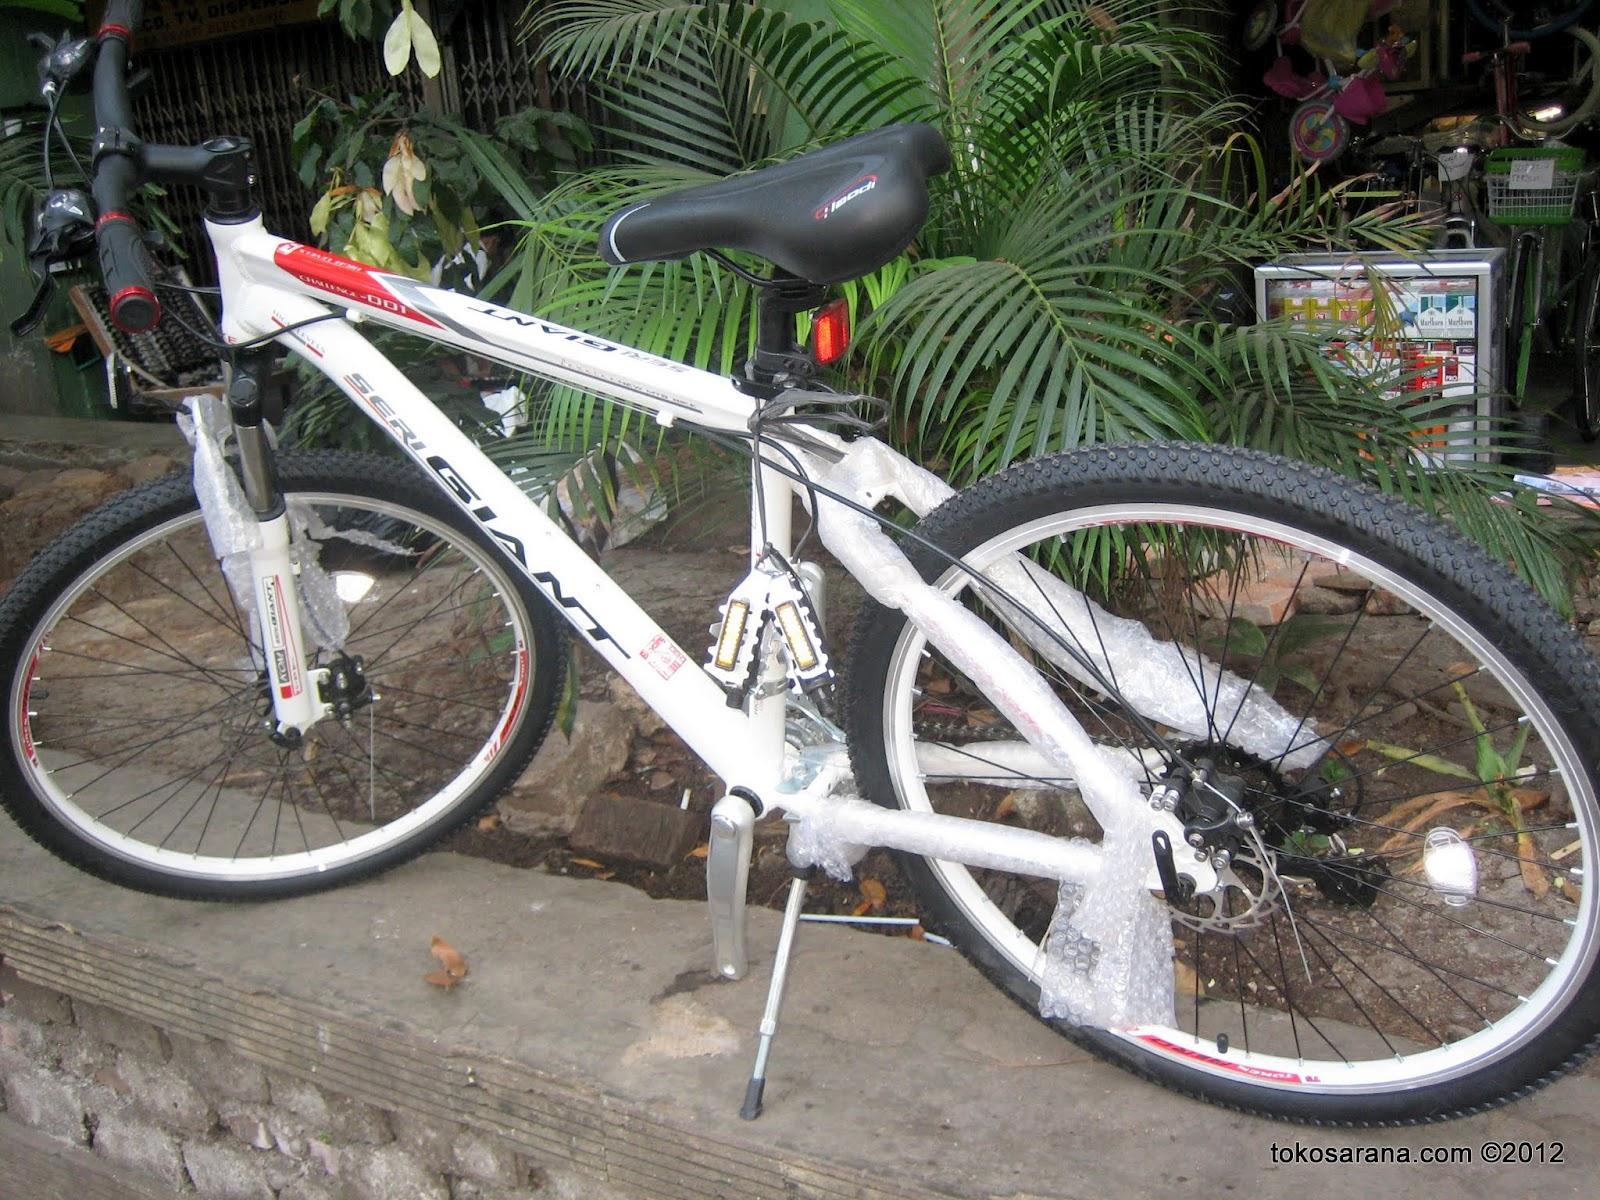 ... Sukses™: Sepeda Gunung Giant Challenge Aluminium Alloy Frame 26 Inci